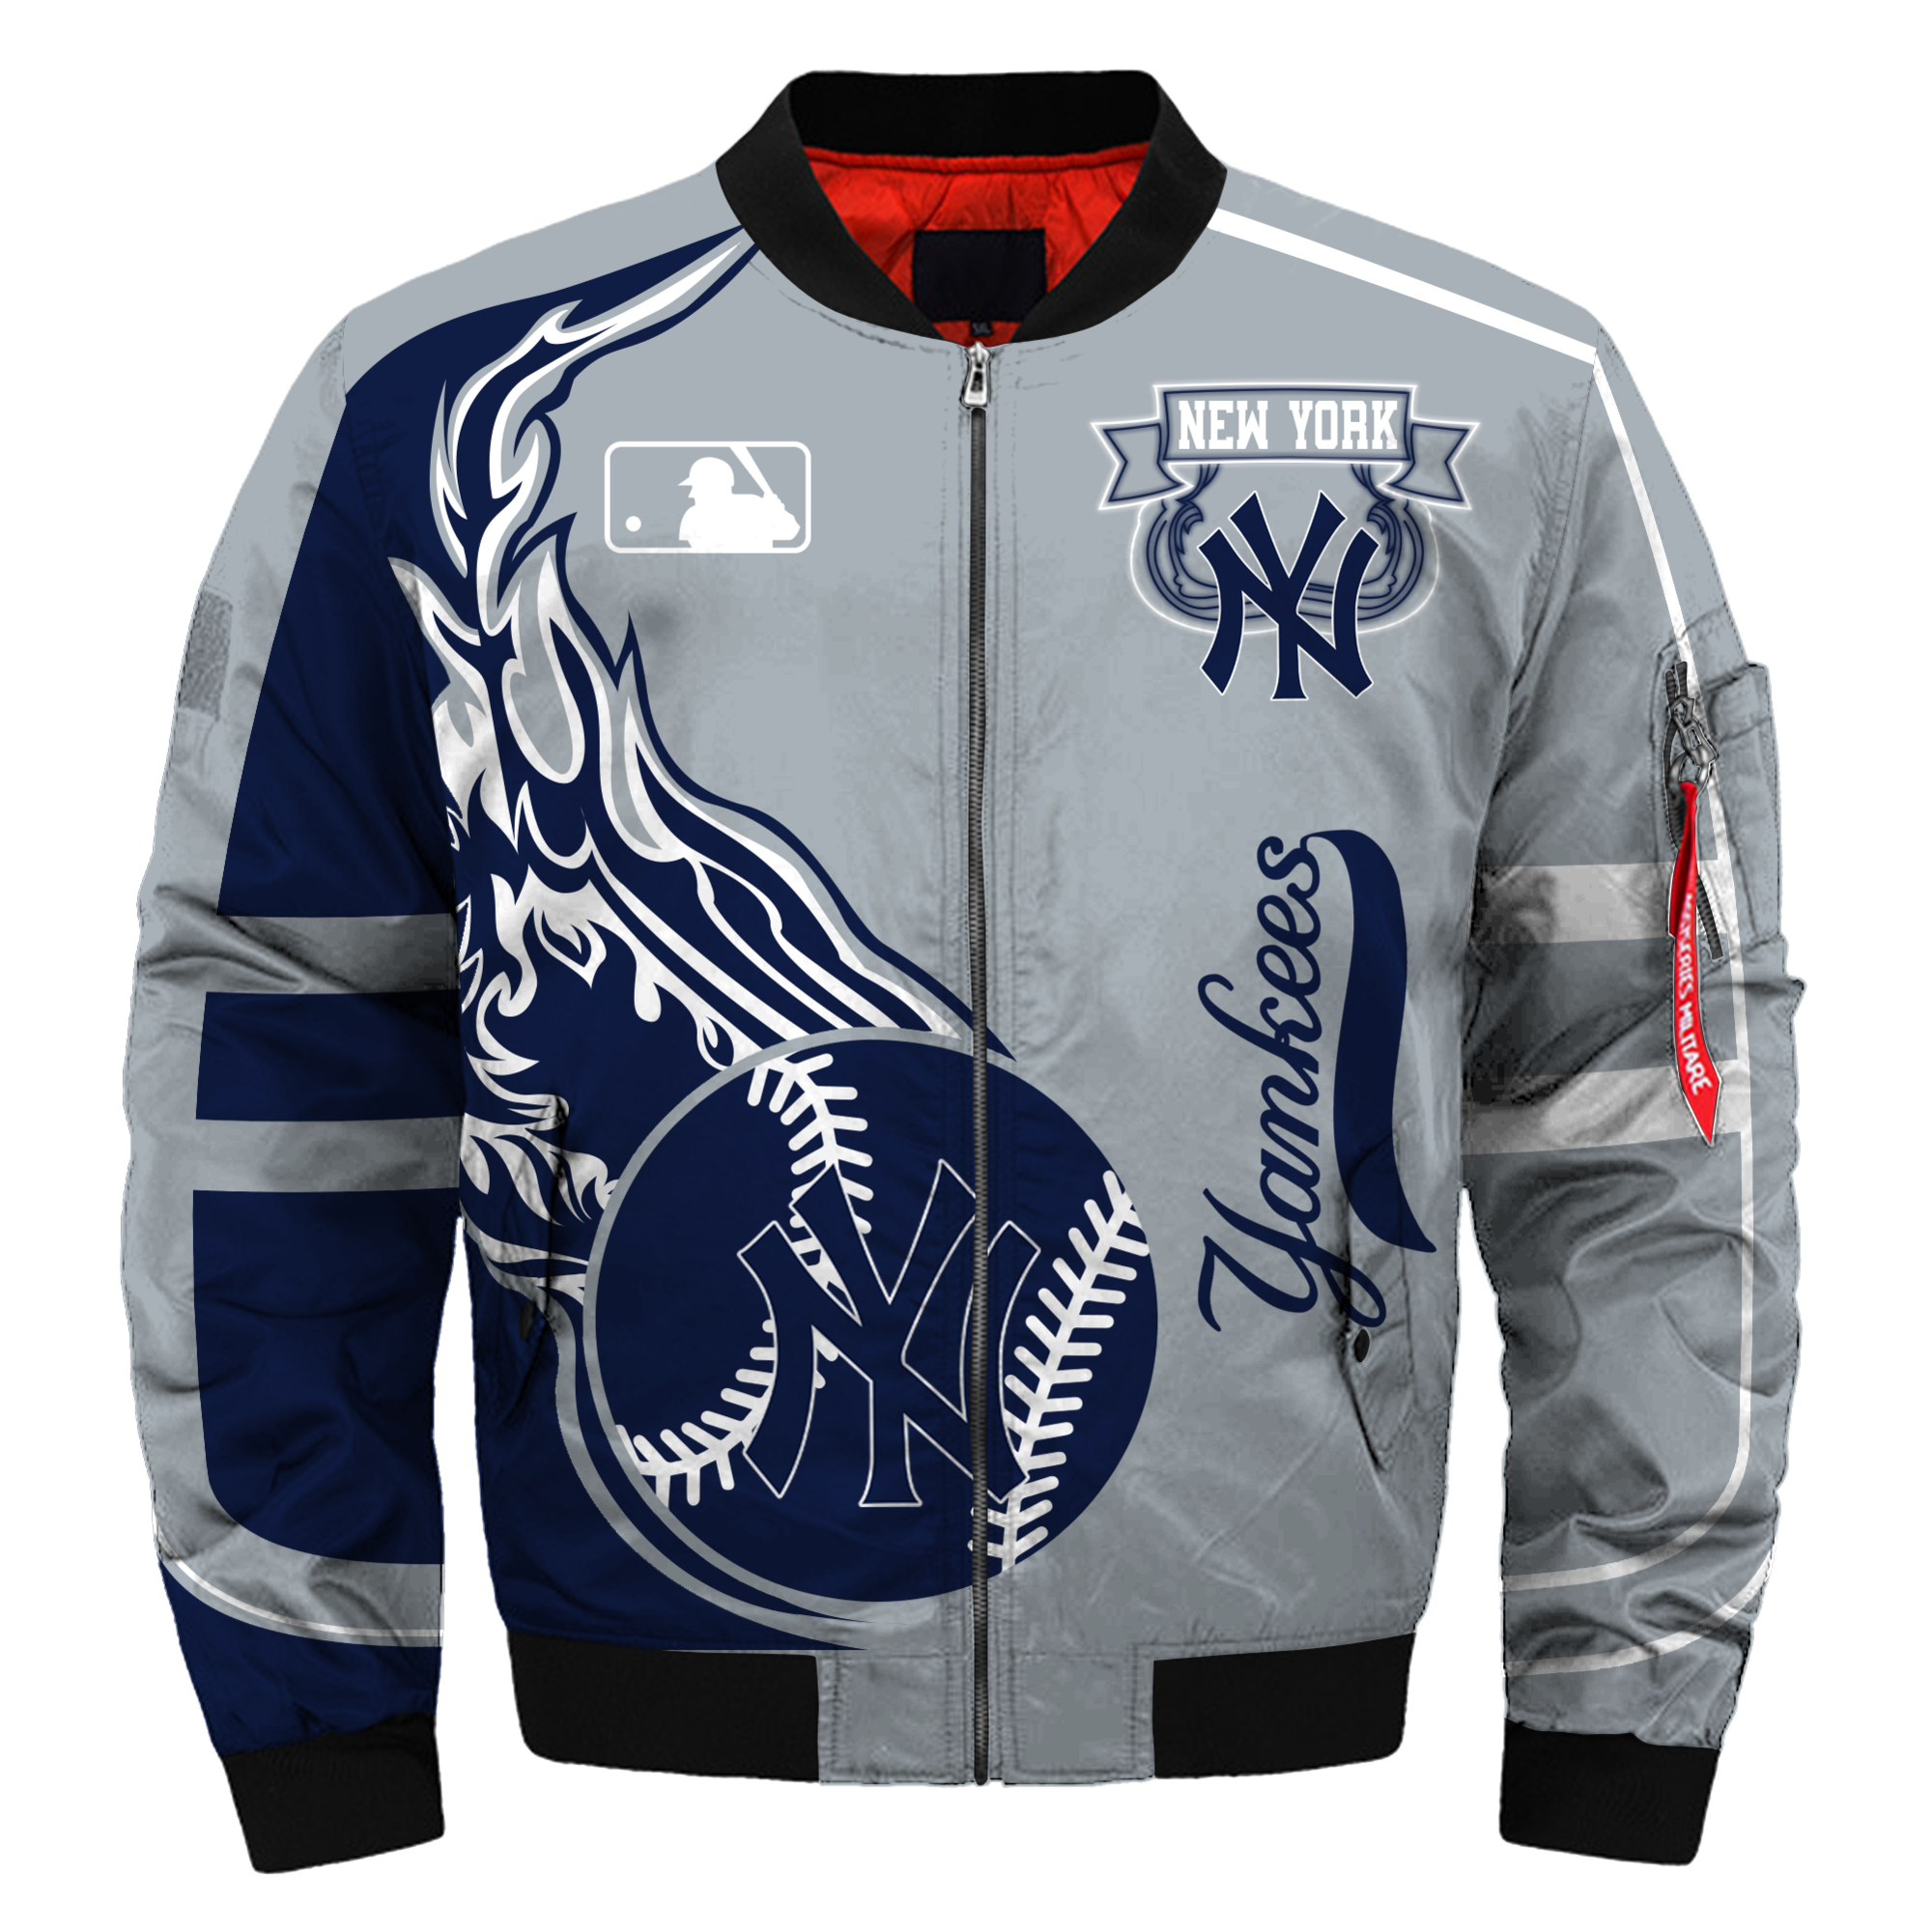 New York Yankees Bomber Jacket Mlb New York Yankees Apparel New York Yankees Apparel Yankees Outfit Bomber Jacket Women